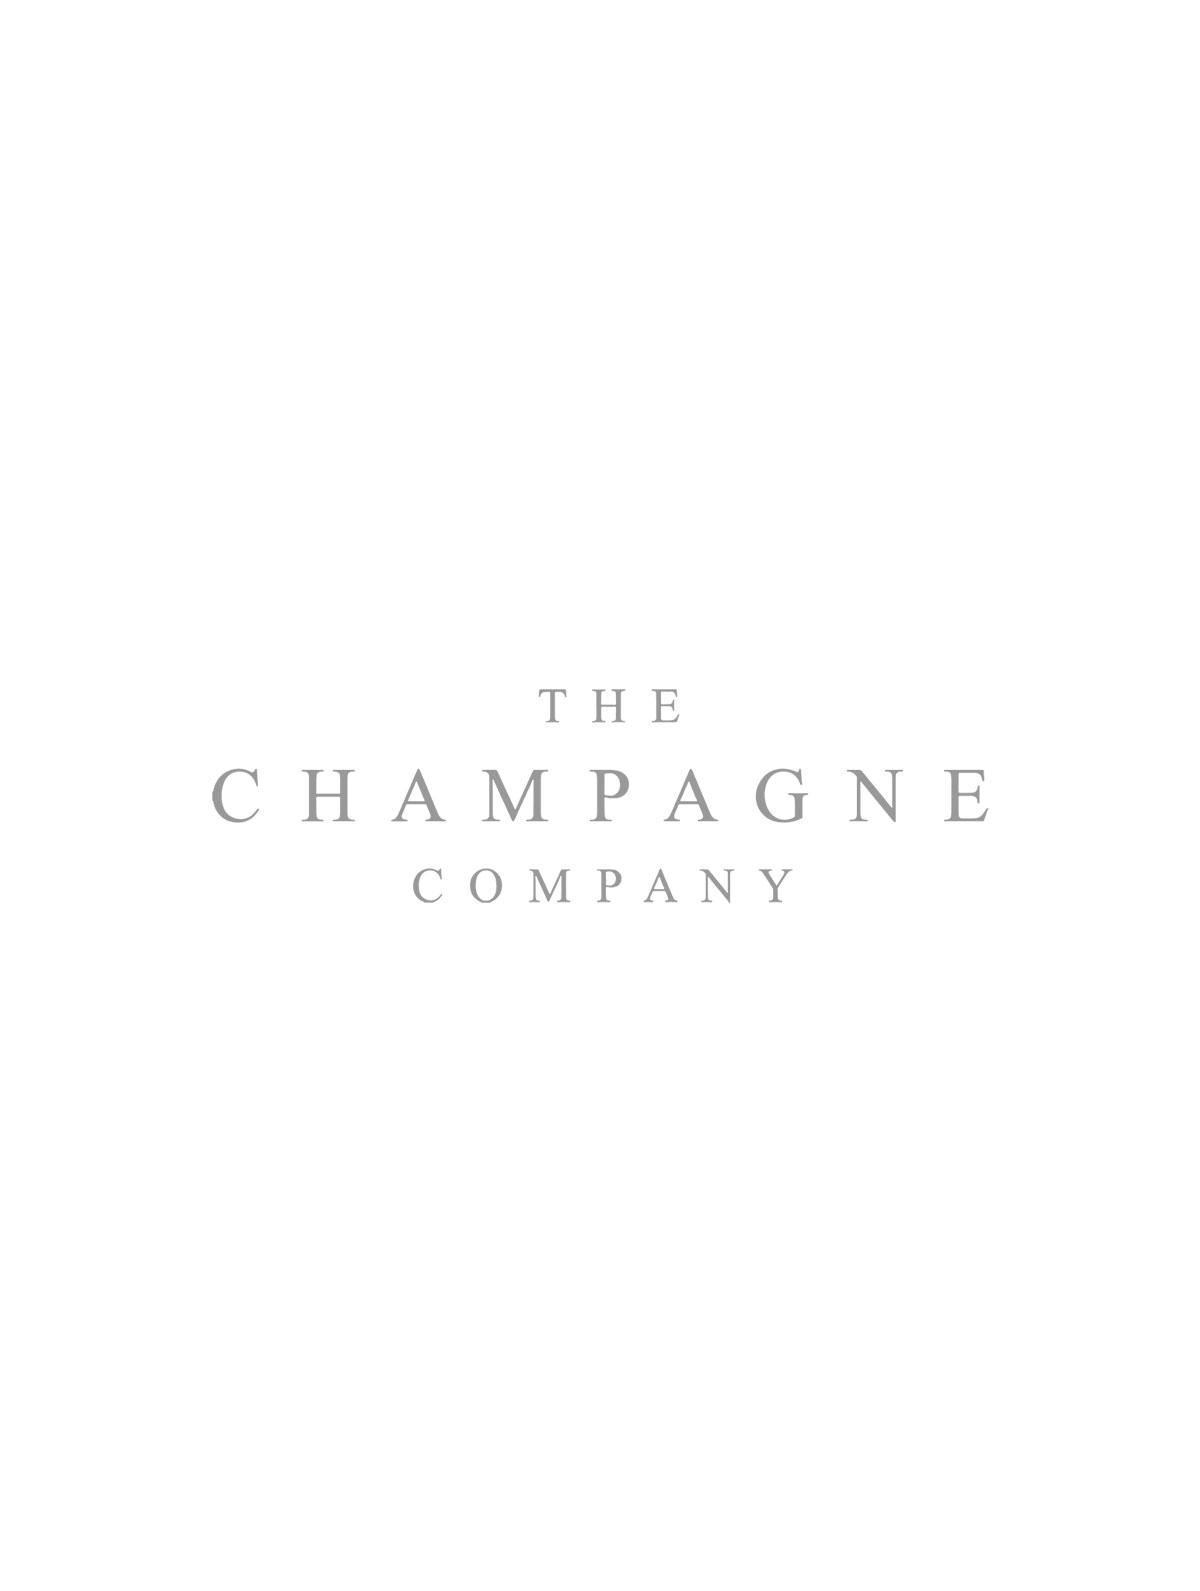 Ornellaia Le Serre Nuove 2015 Wine Tuscany Italy 70cl